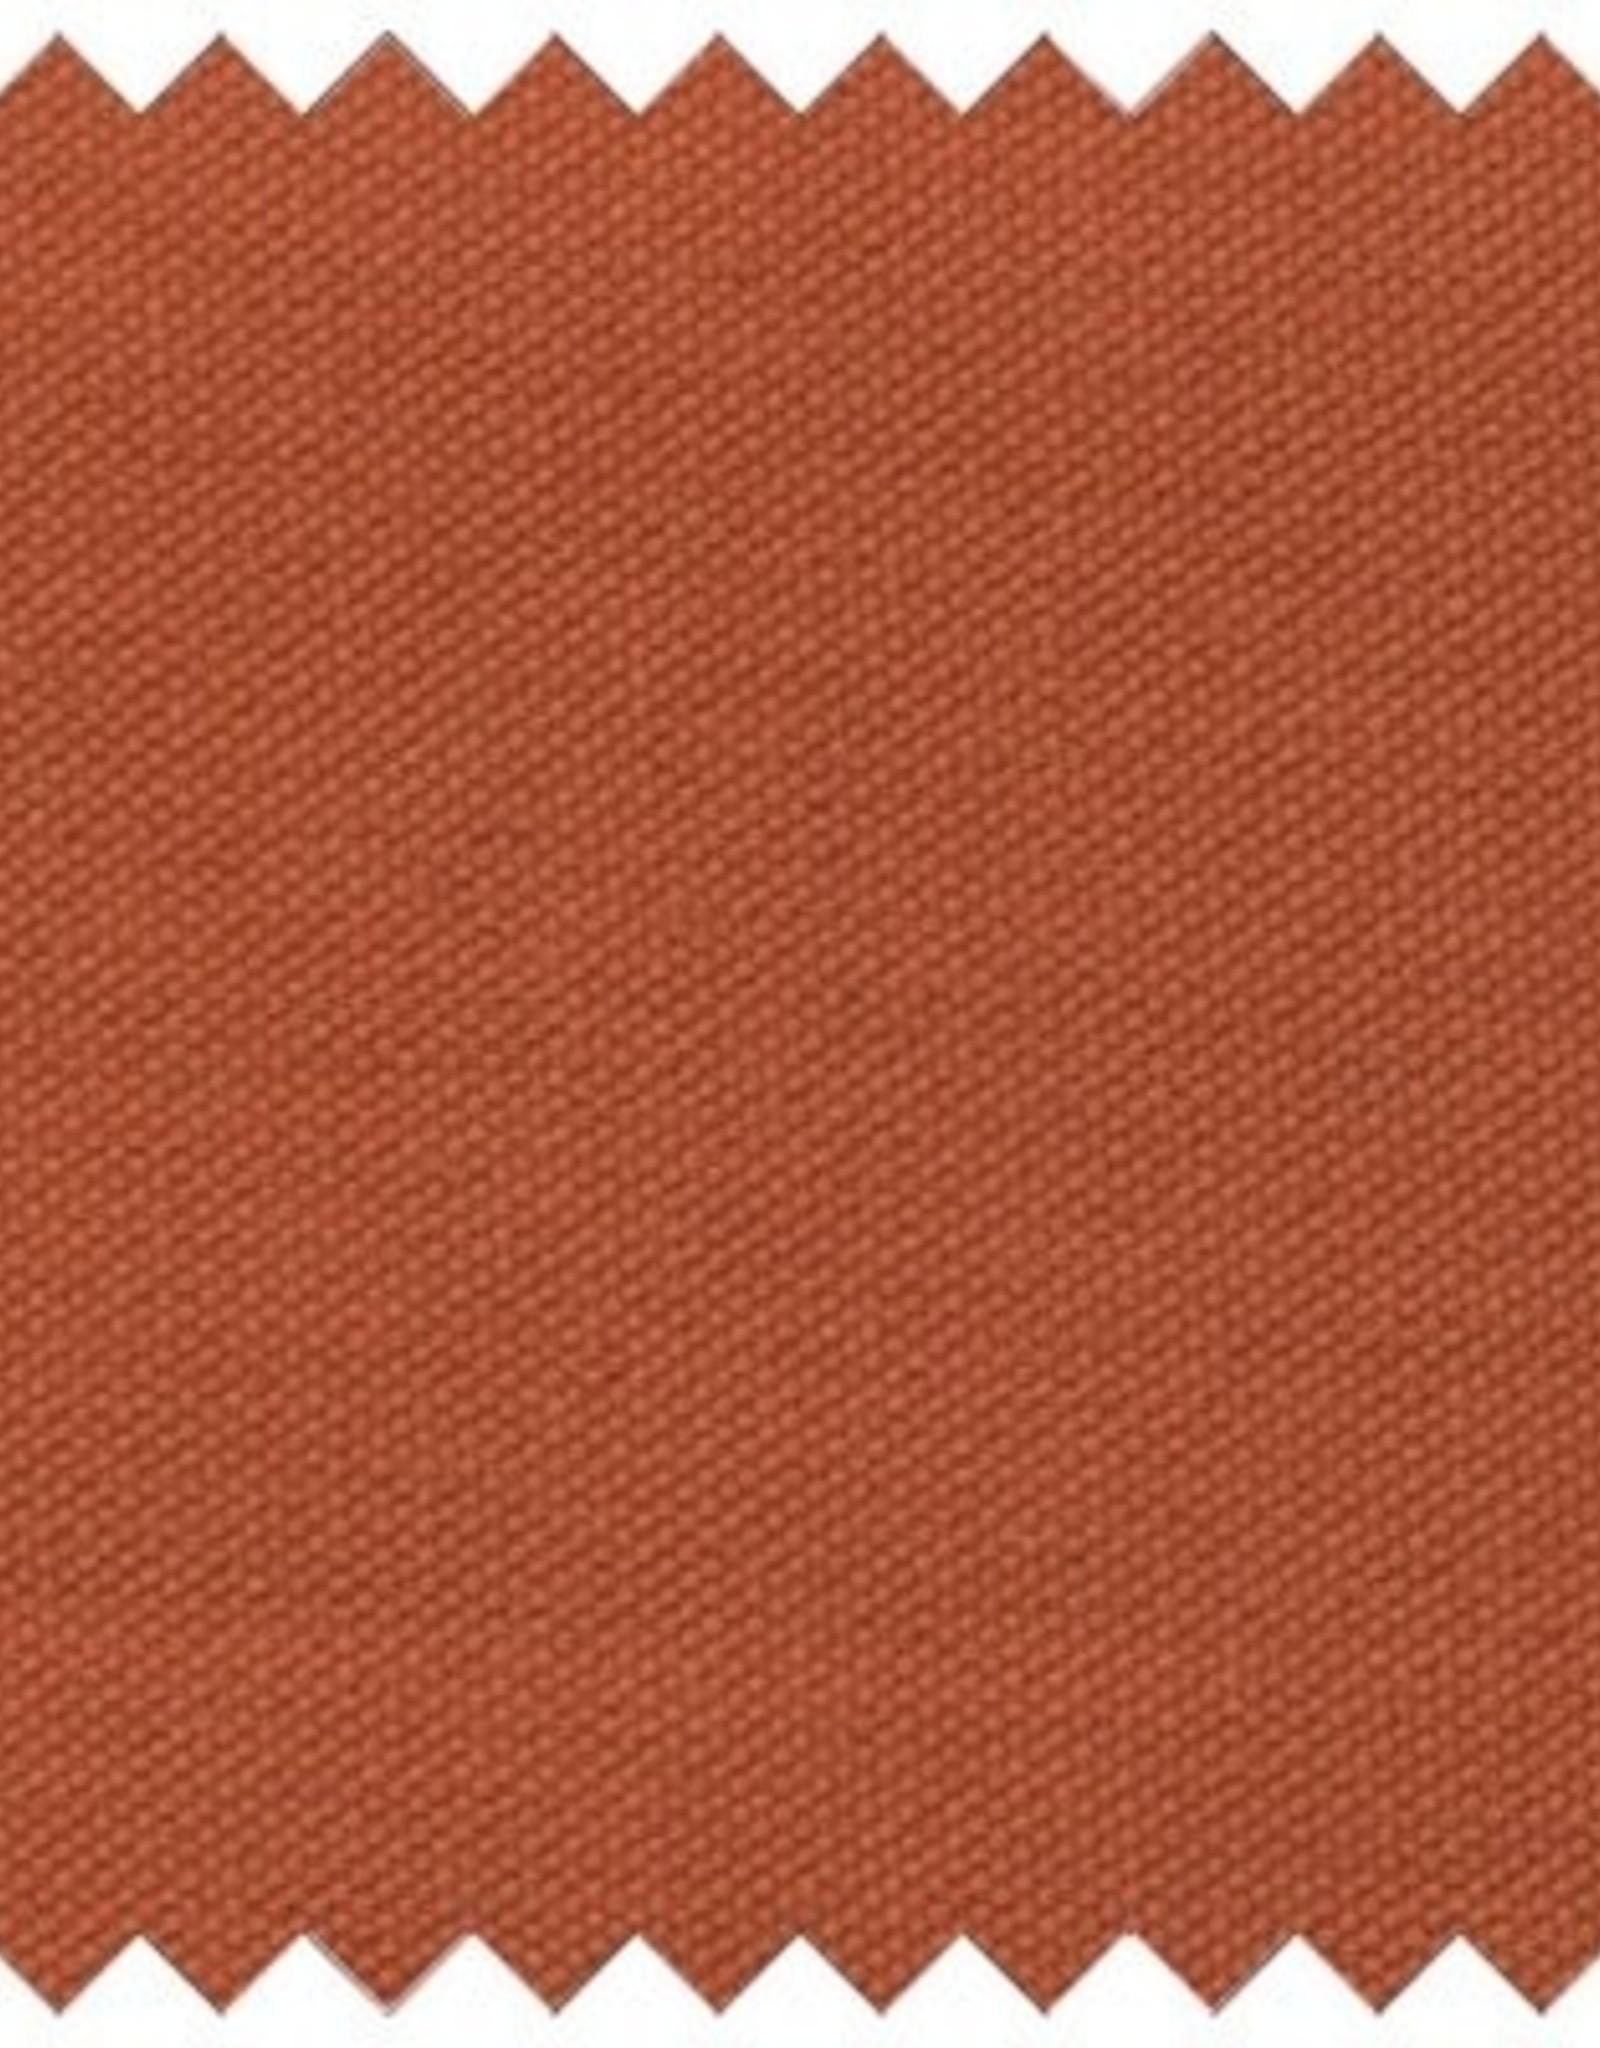 Carolina Morning Designs Buckwheat Yoga Block - Organic Pumpkin